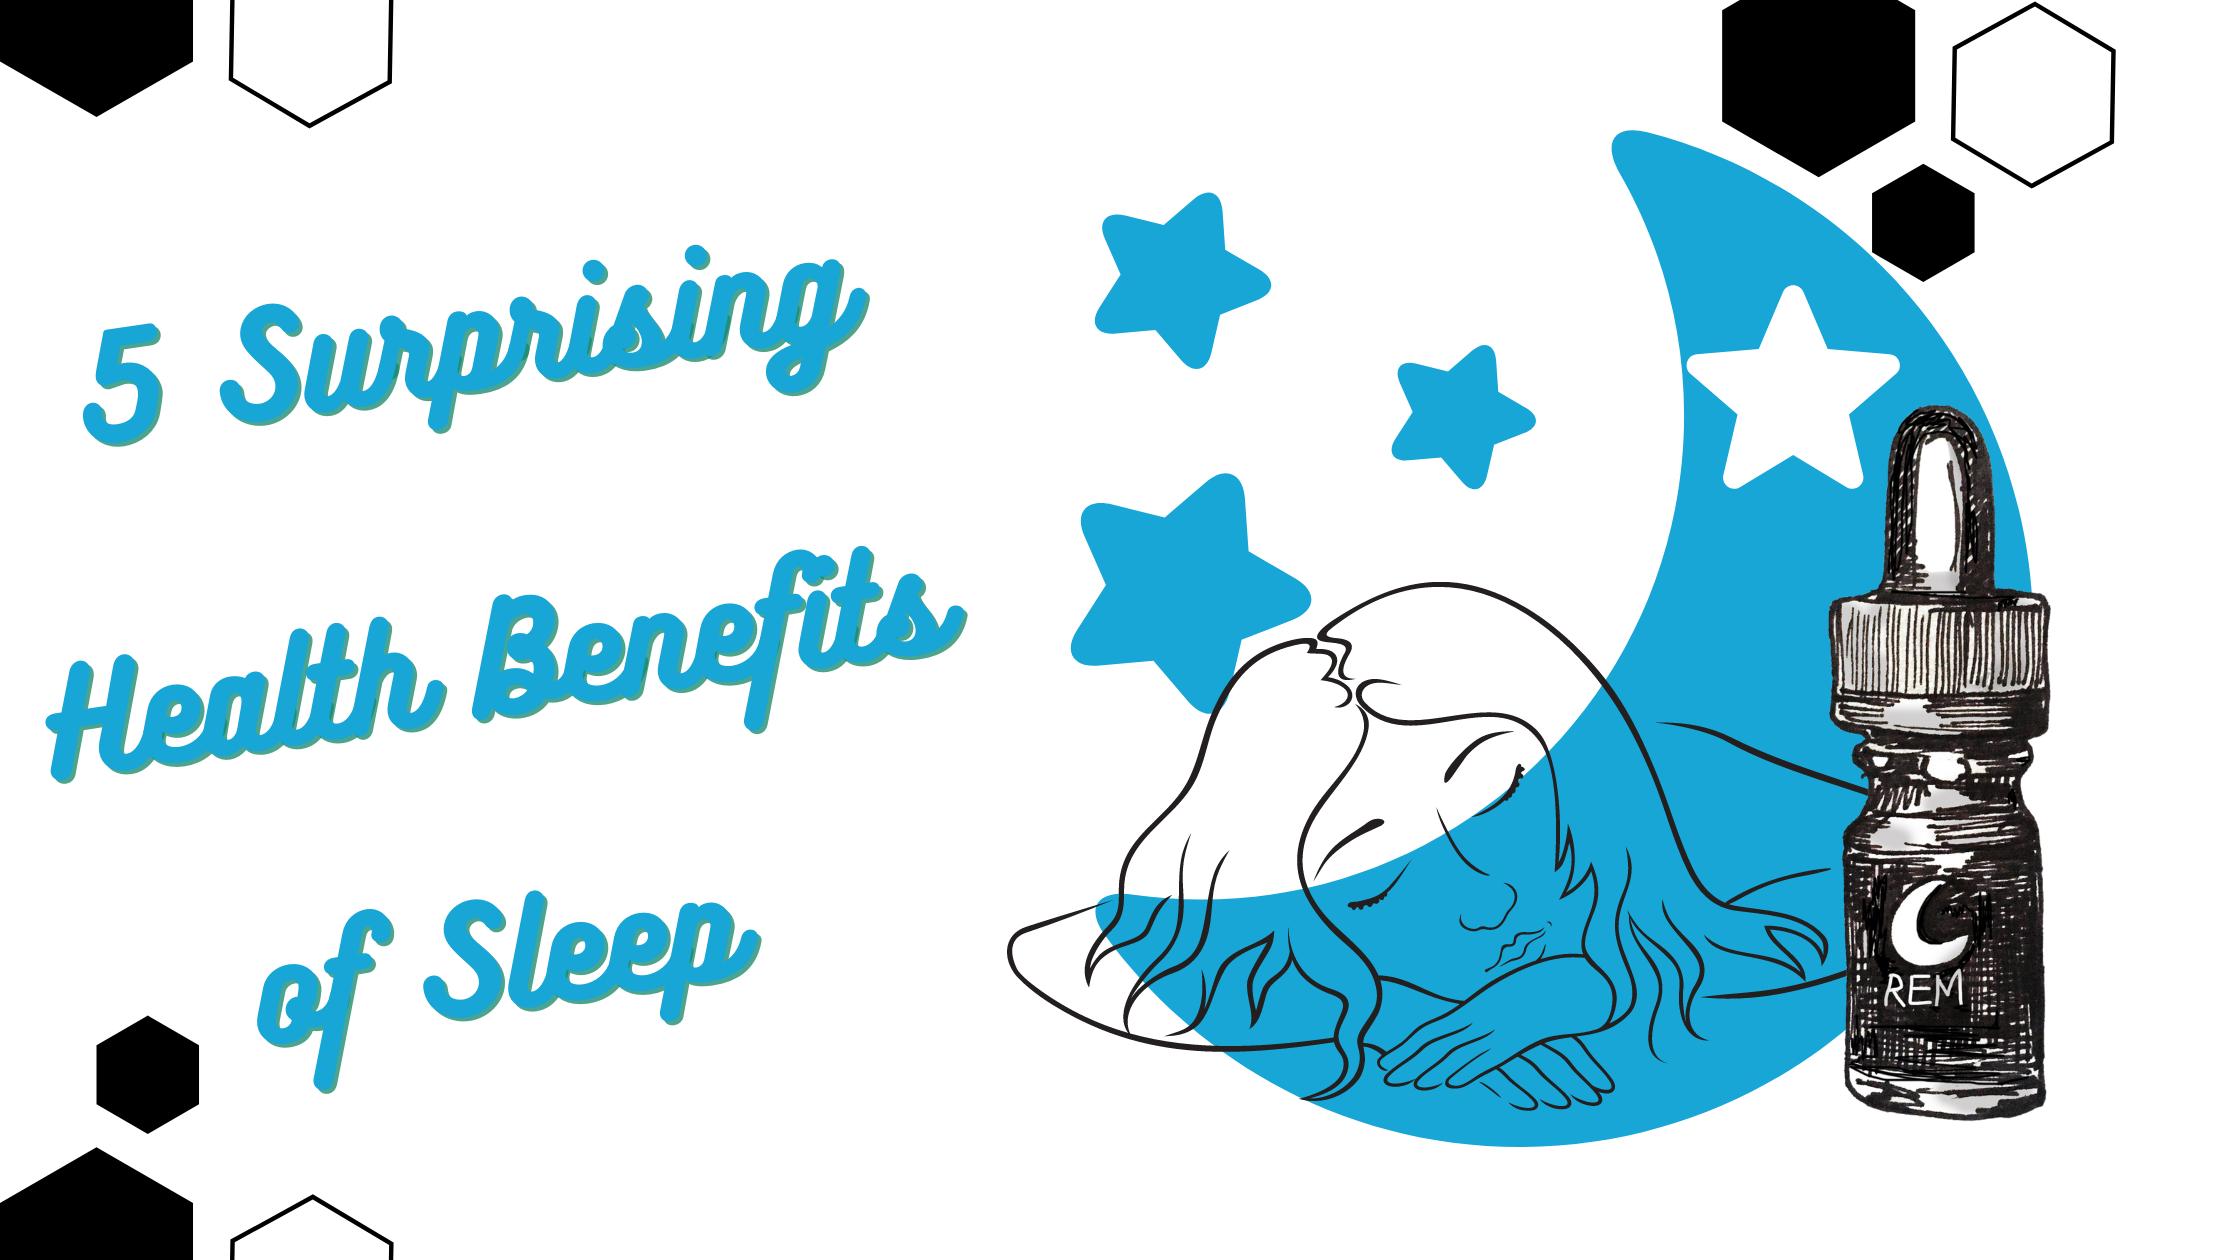 5 Surprising Health Benefits of Sleep Blog Banner